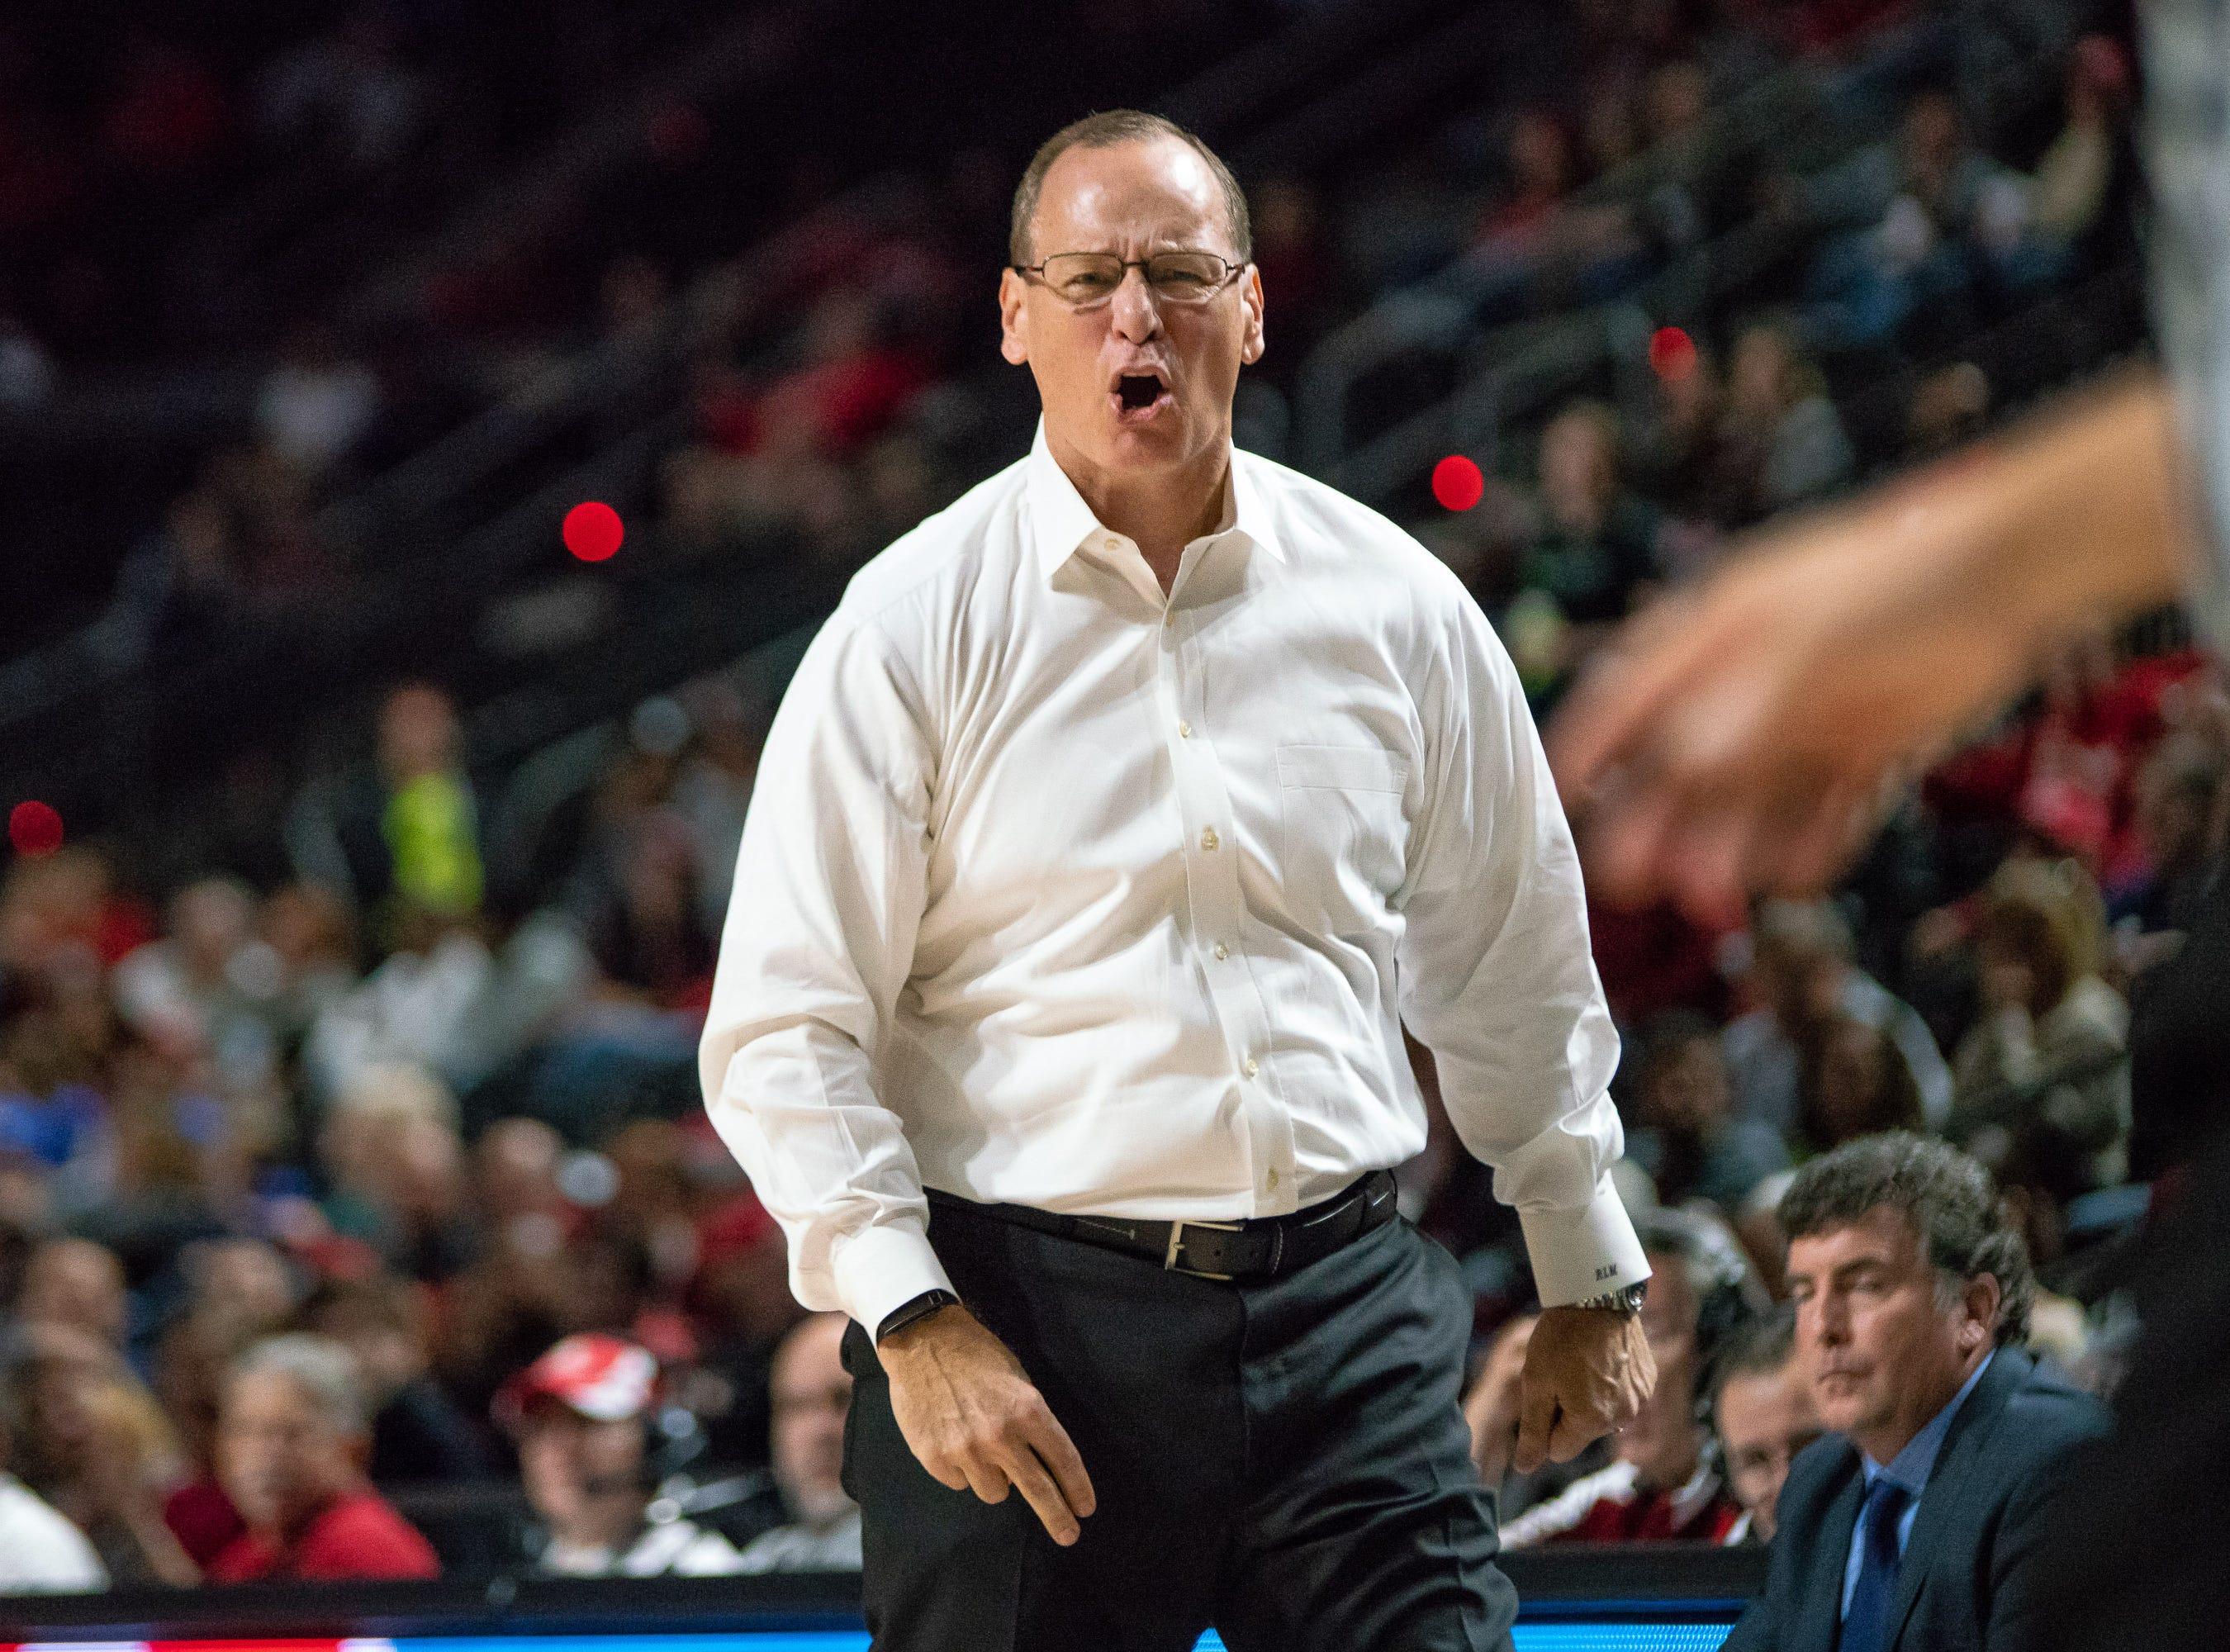 UL's head basketball coach Bob Marlin reacting negatively to a call as the Ragin' Cajuns take on the LA Tech Bulldogs at the Cajundome on December 15, 2018.